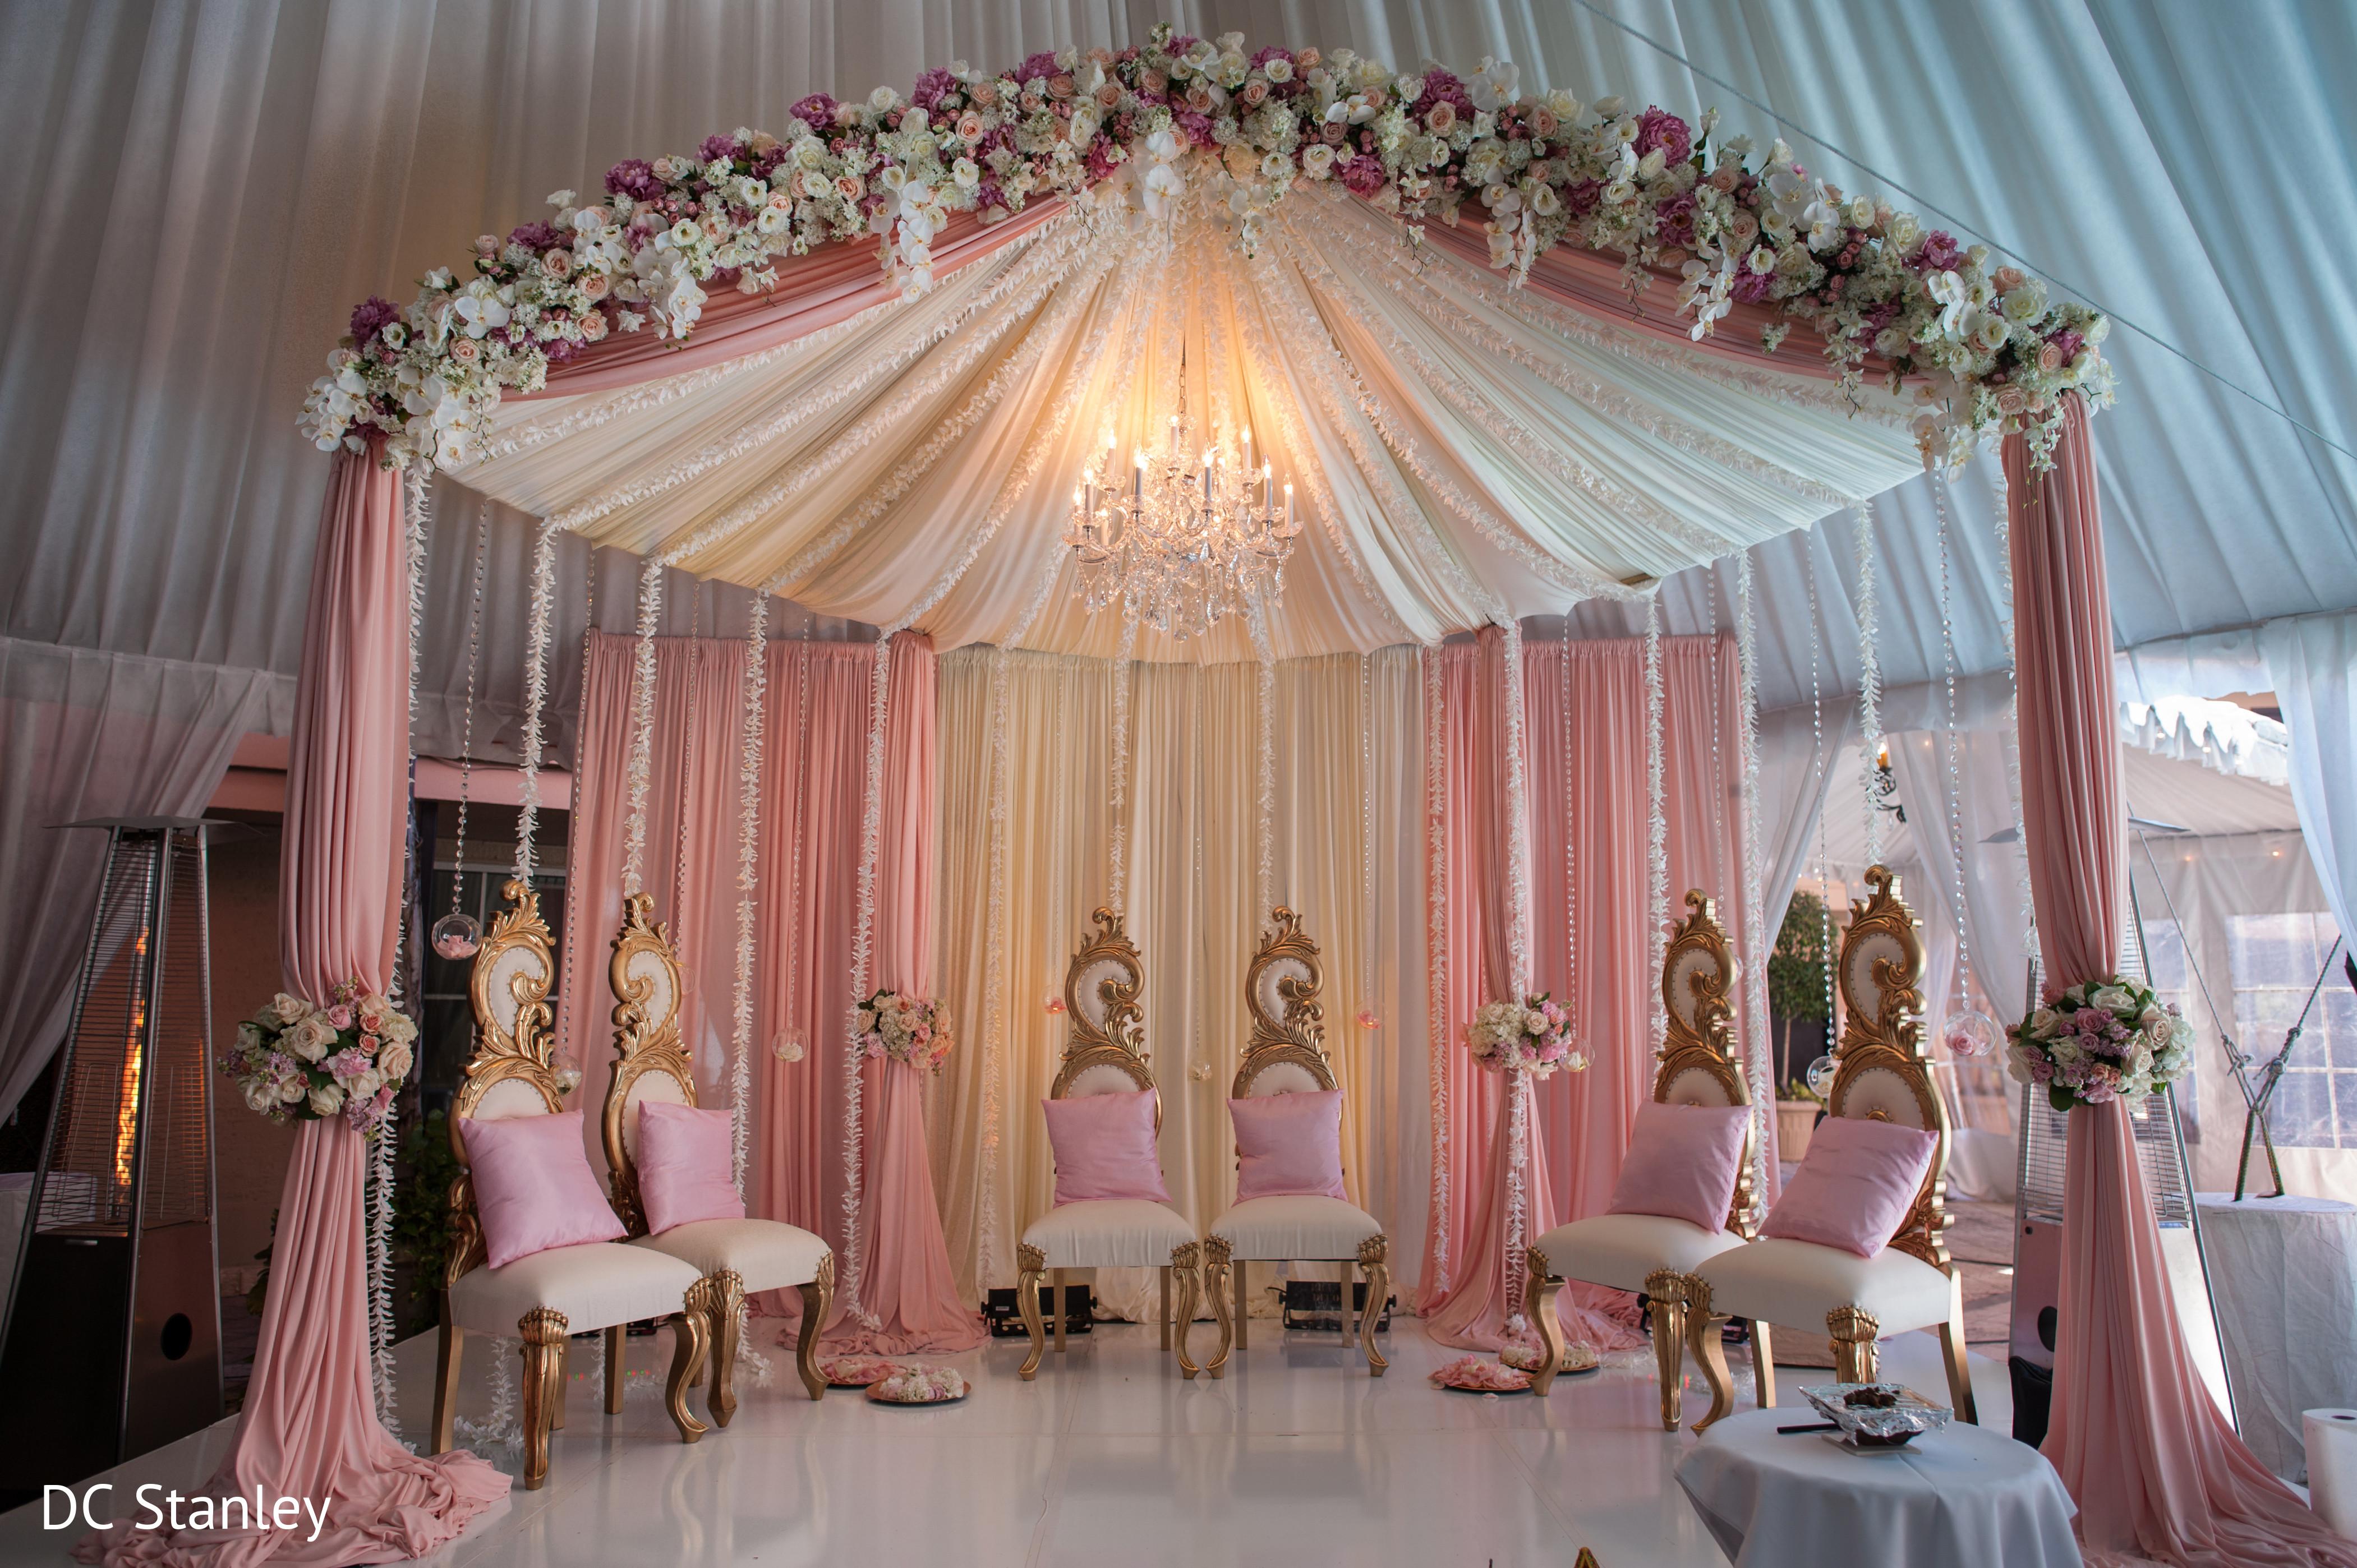 30891 082 Sen Wedding Orig Outstanding Indian Decorations Nj Pics Decors Decoration Ideas